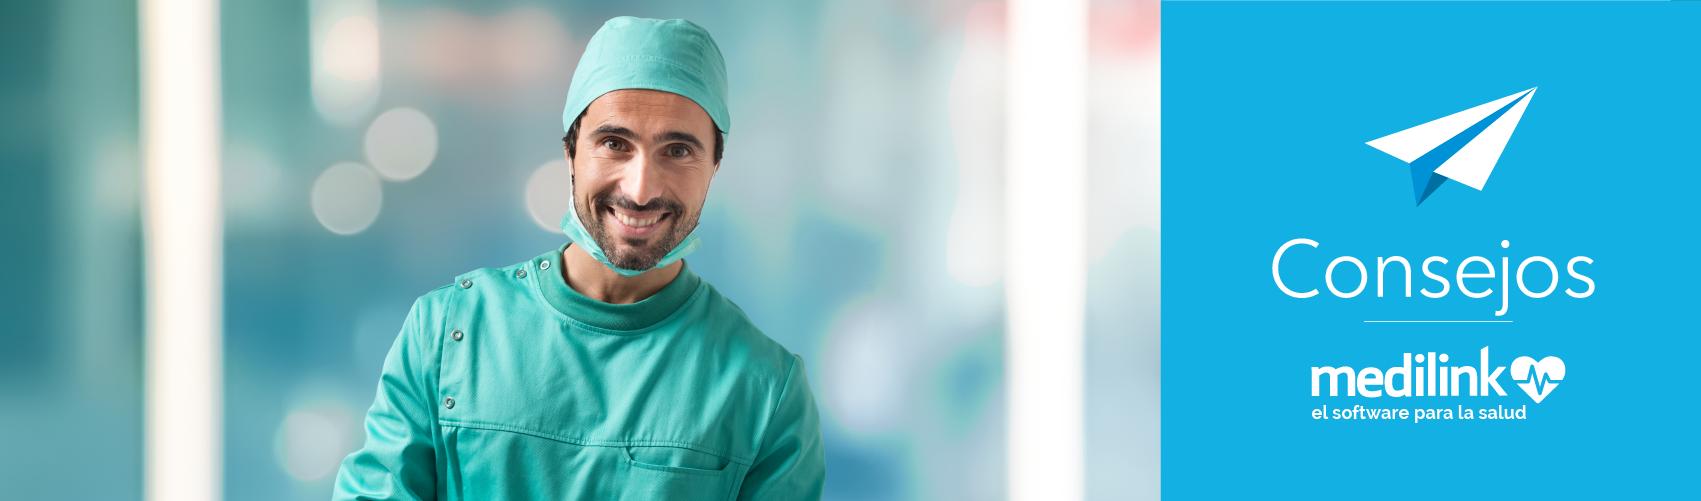 Cómo atraer pacientes a tu clínica